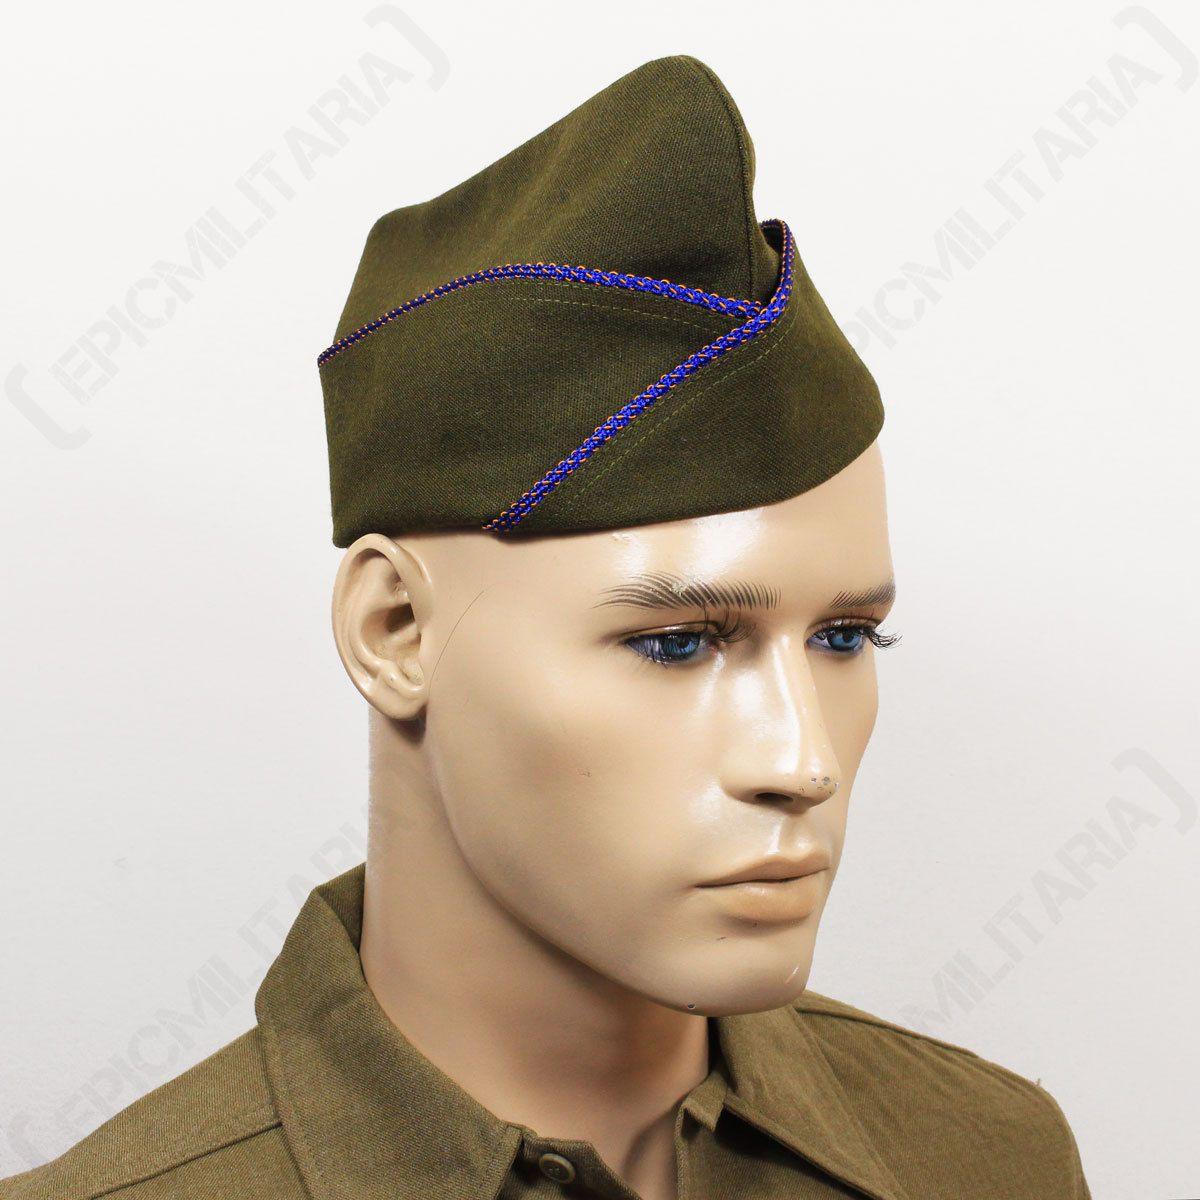 57892bc8 1980's Vintage Garrison Cap w Red Star / Military USSR Communist Hat /  Soviet Cap / cold war clothing in 2019 | CallMeCleverVintage—My Etsy Shop |  Garrison ...